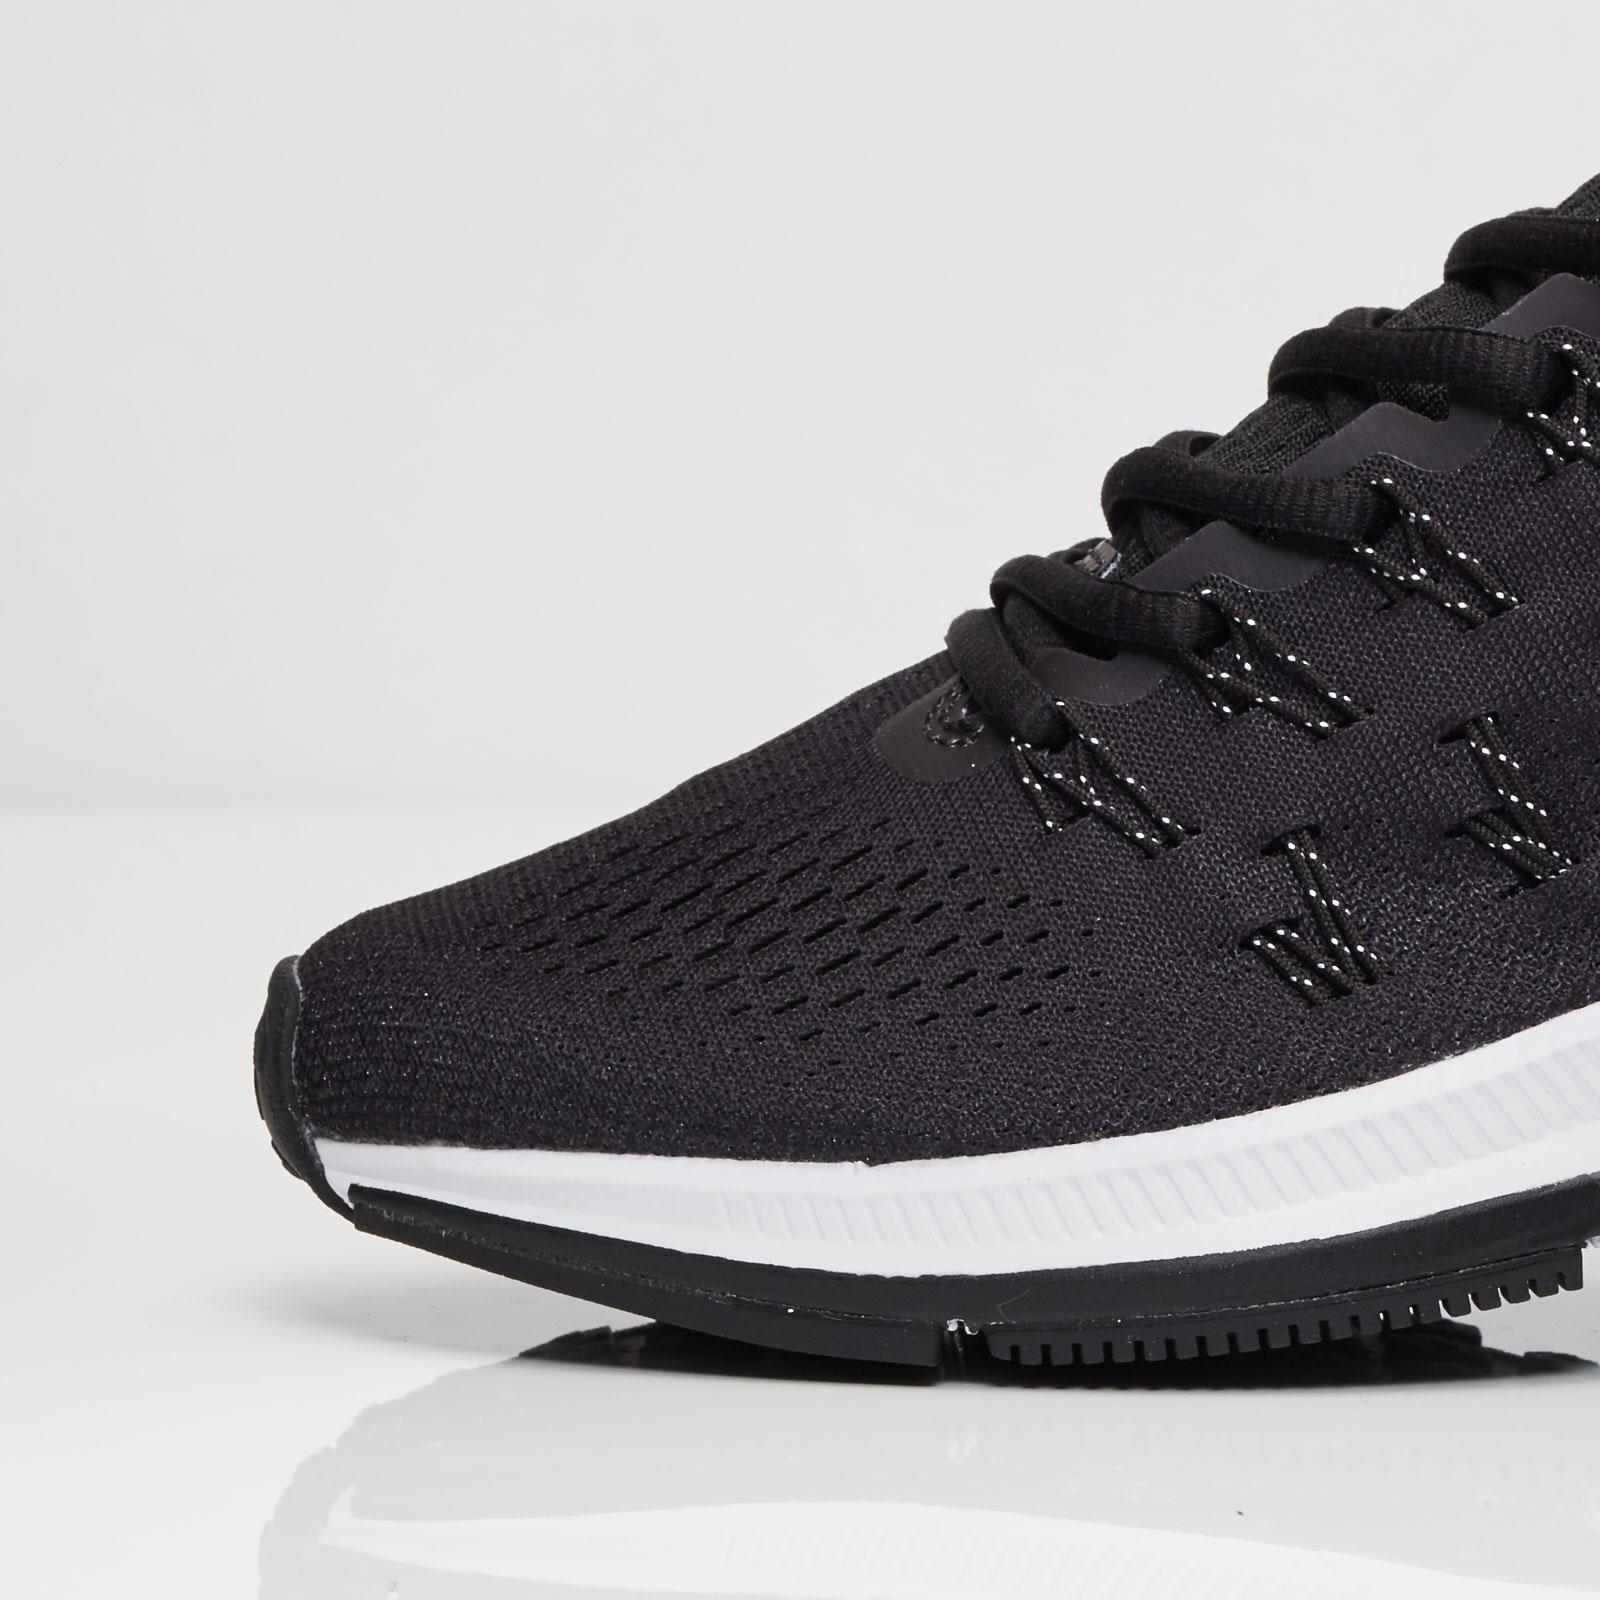 e448aa26143b4 Nike Air Zoom Pegasus 33 - 831352-001 - Sneakersnstuff